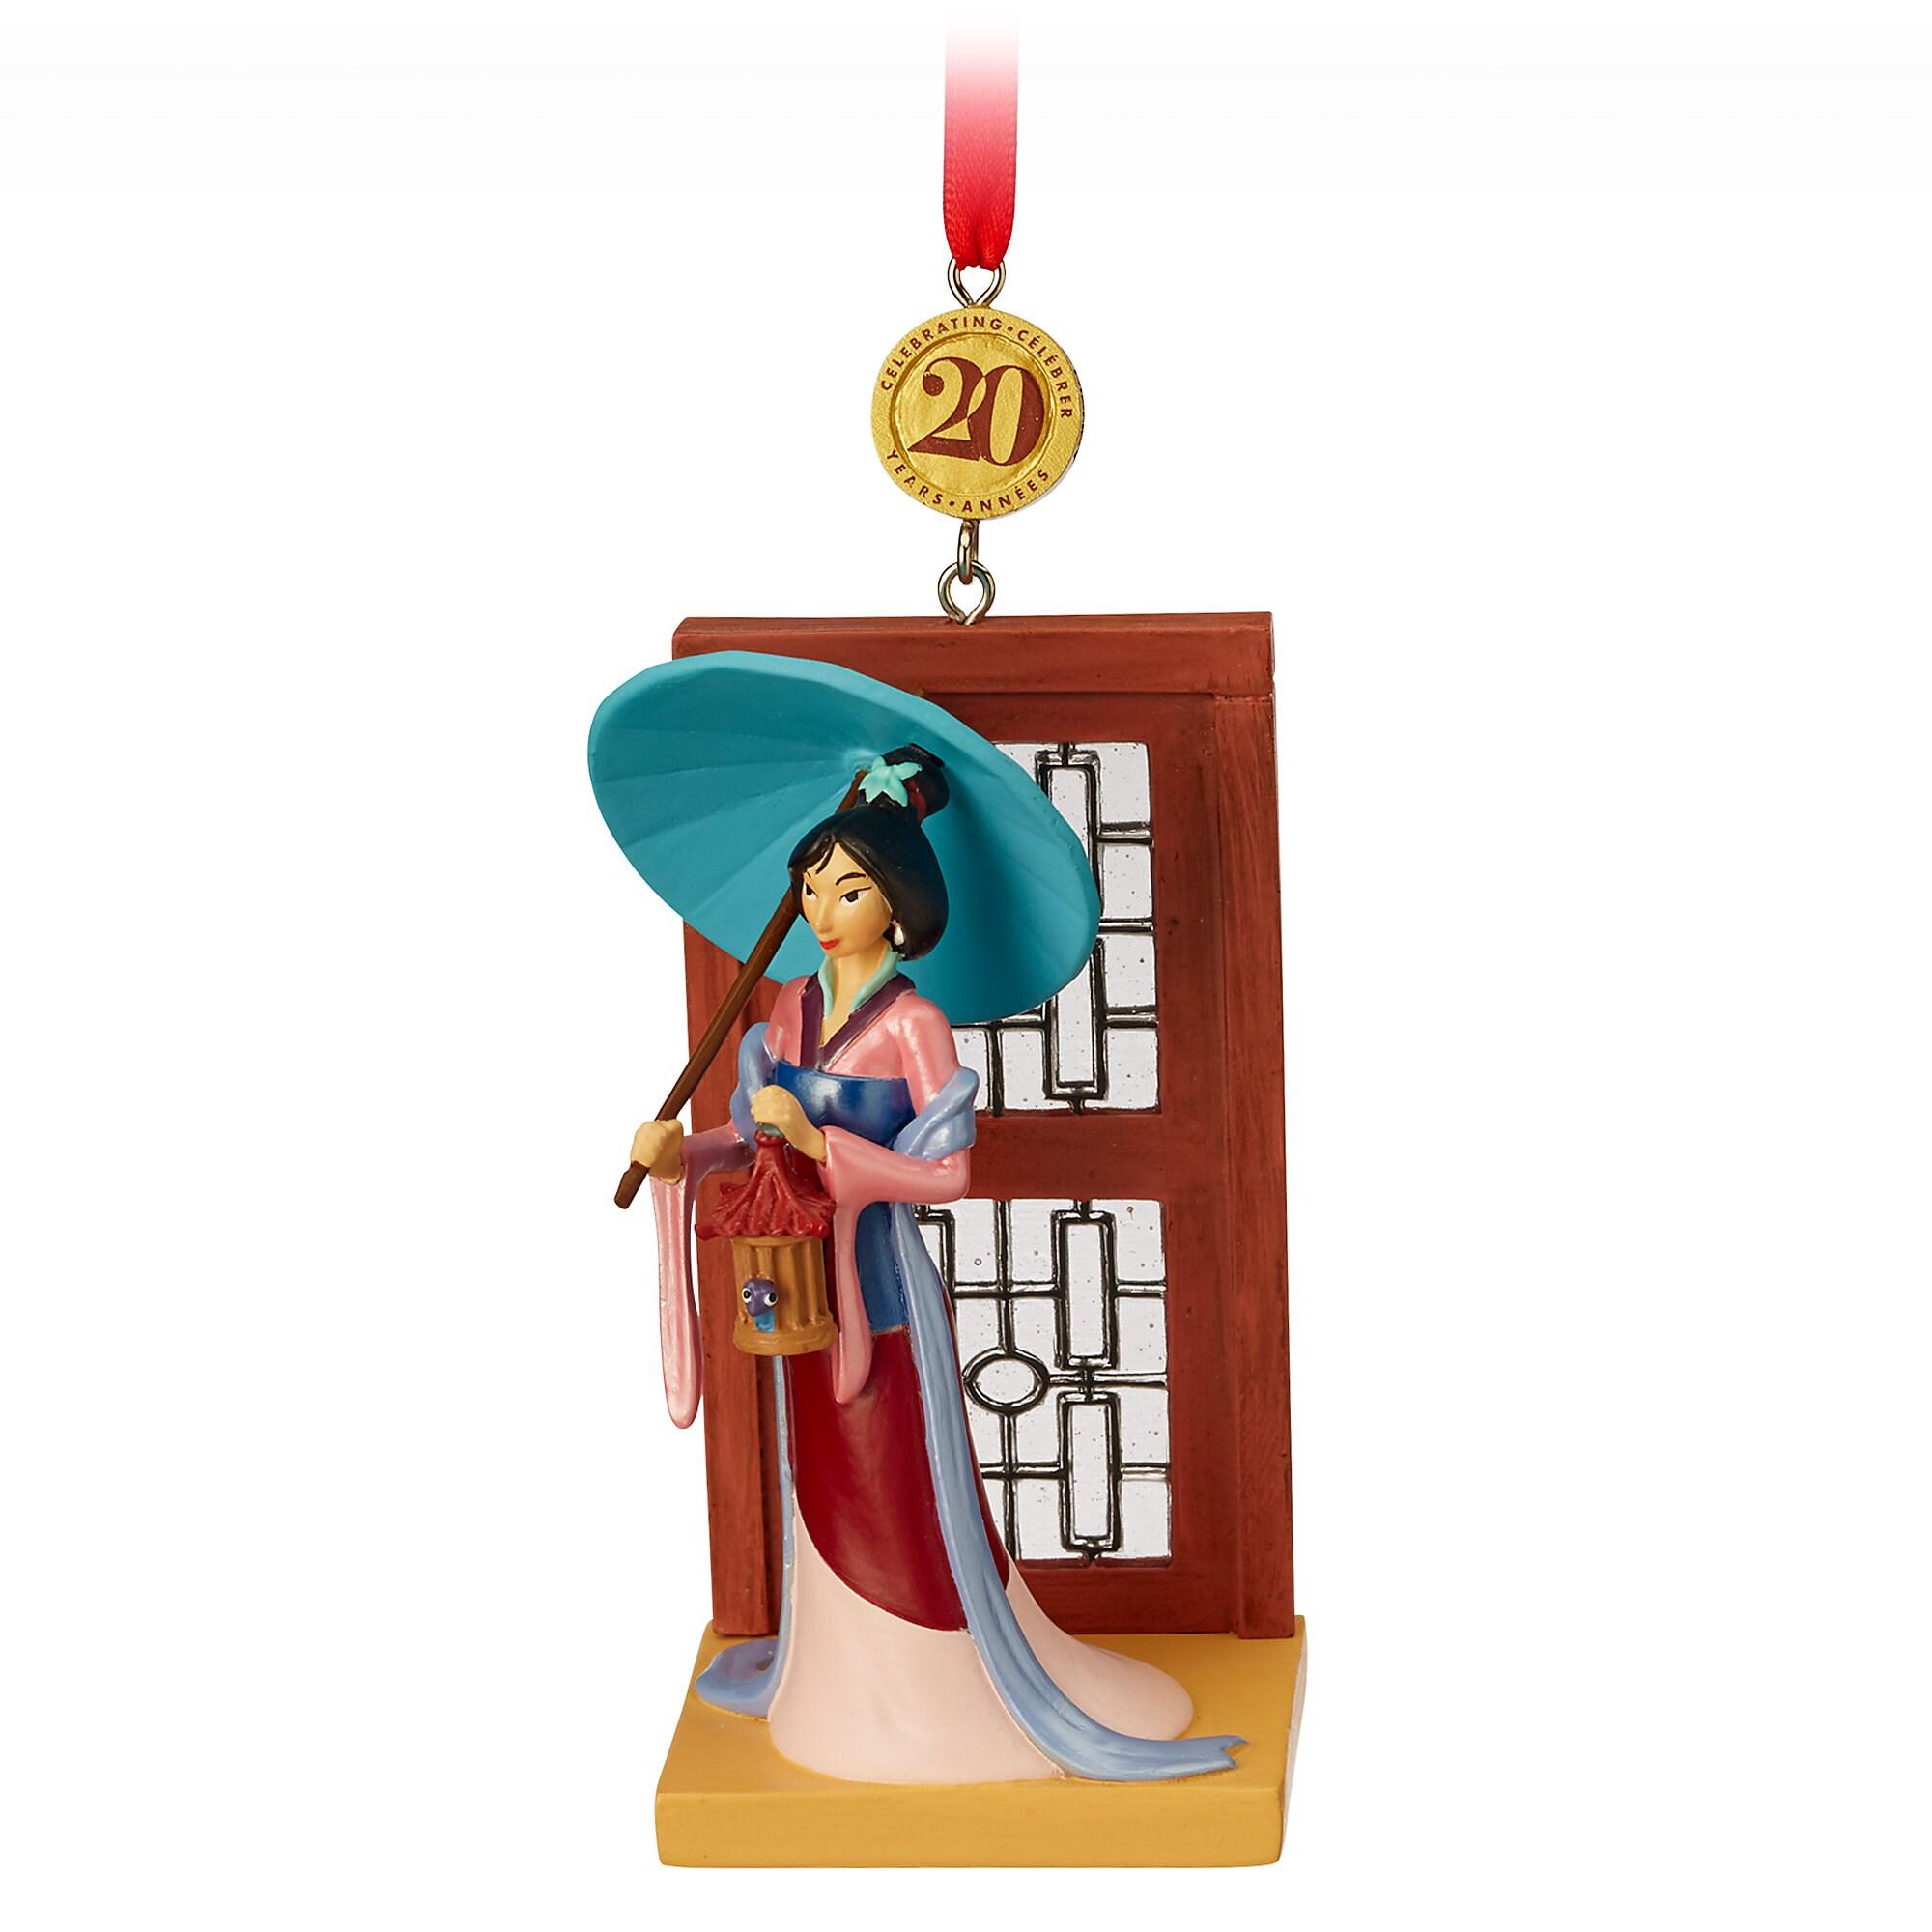 Mulan Legacy Sketchbook Ornament - Limited Release